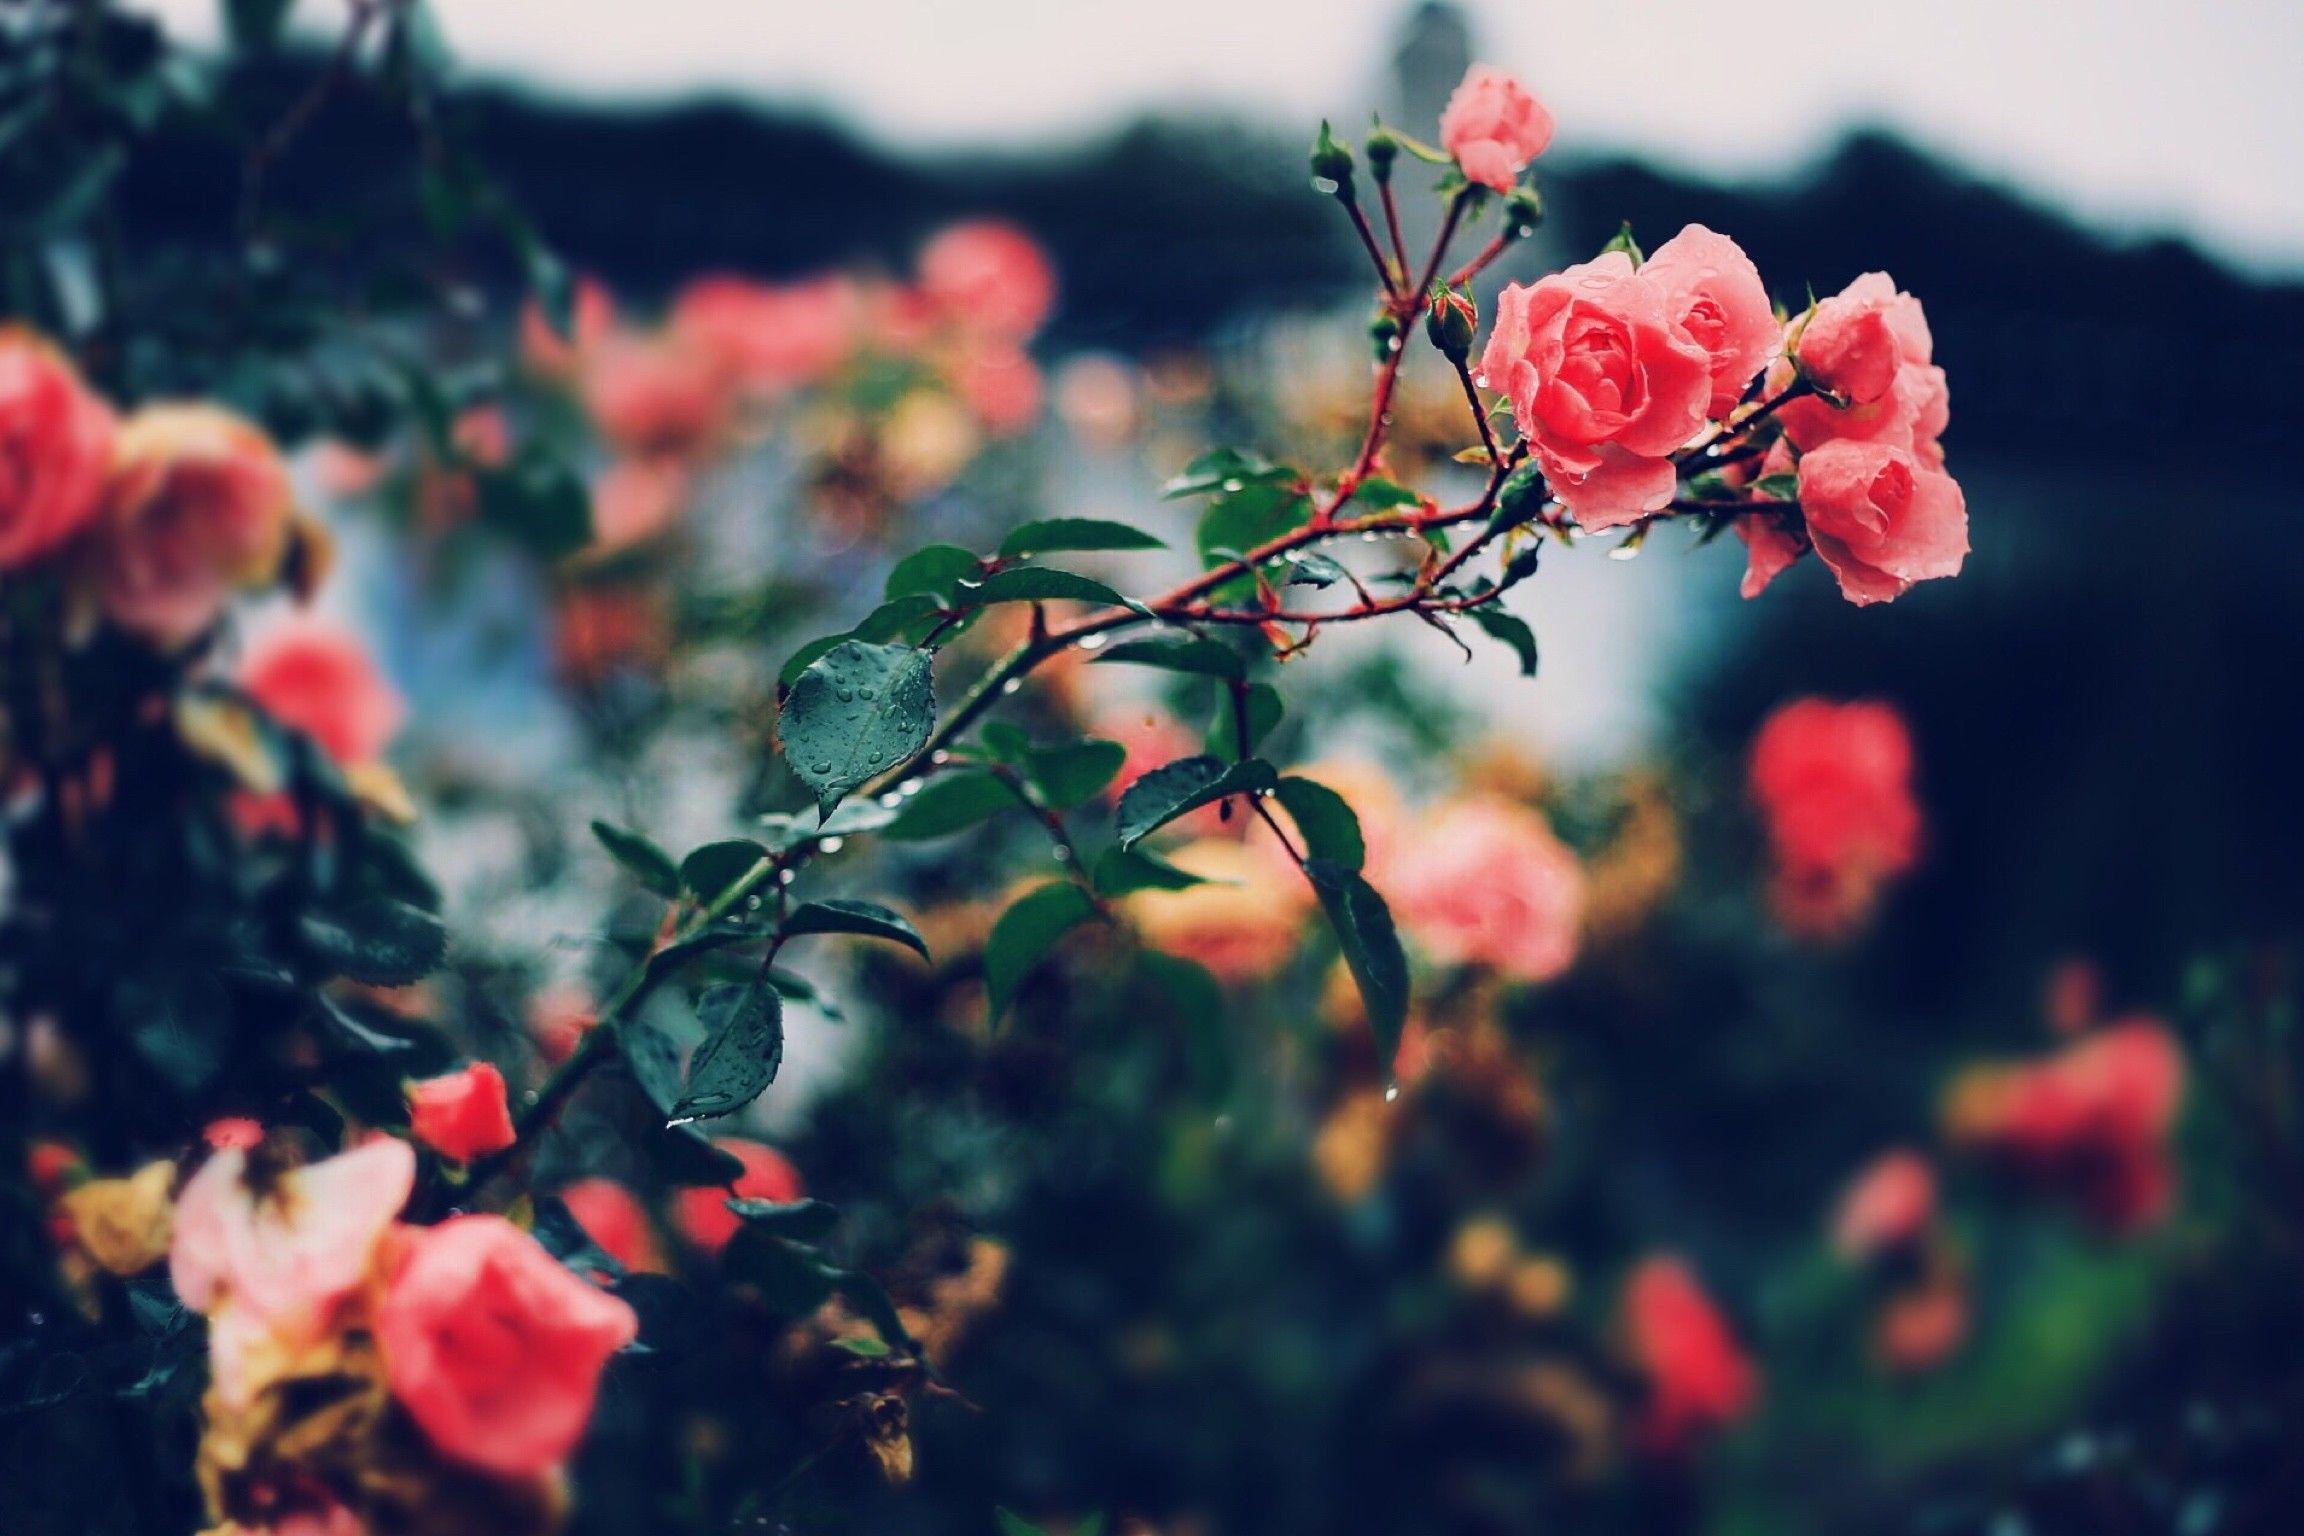 General 2304x1536 plants flowers rose